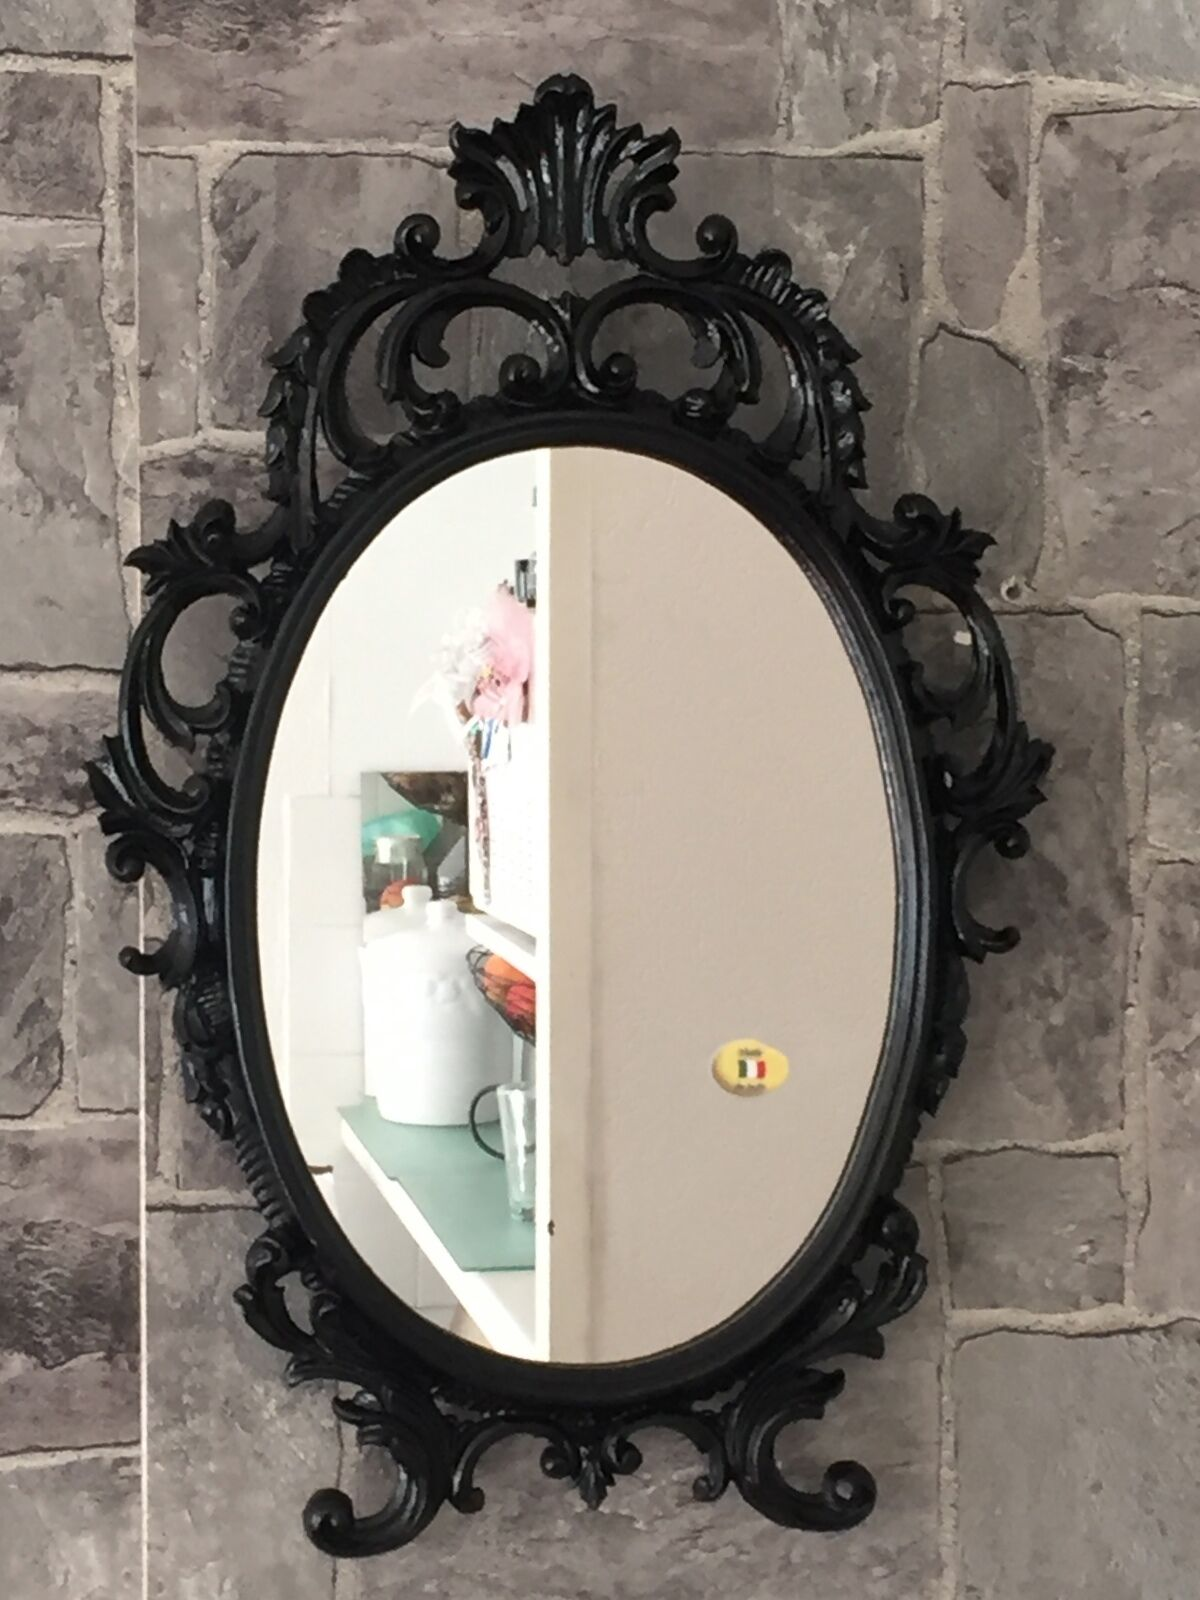 wandspiegel oval barock gold silber schwarz wei 43x28cm spiegel antik shabby kaufen bei. Black Bedroom Furniture Sets. Home Design Ideas